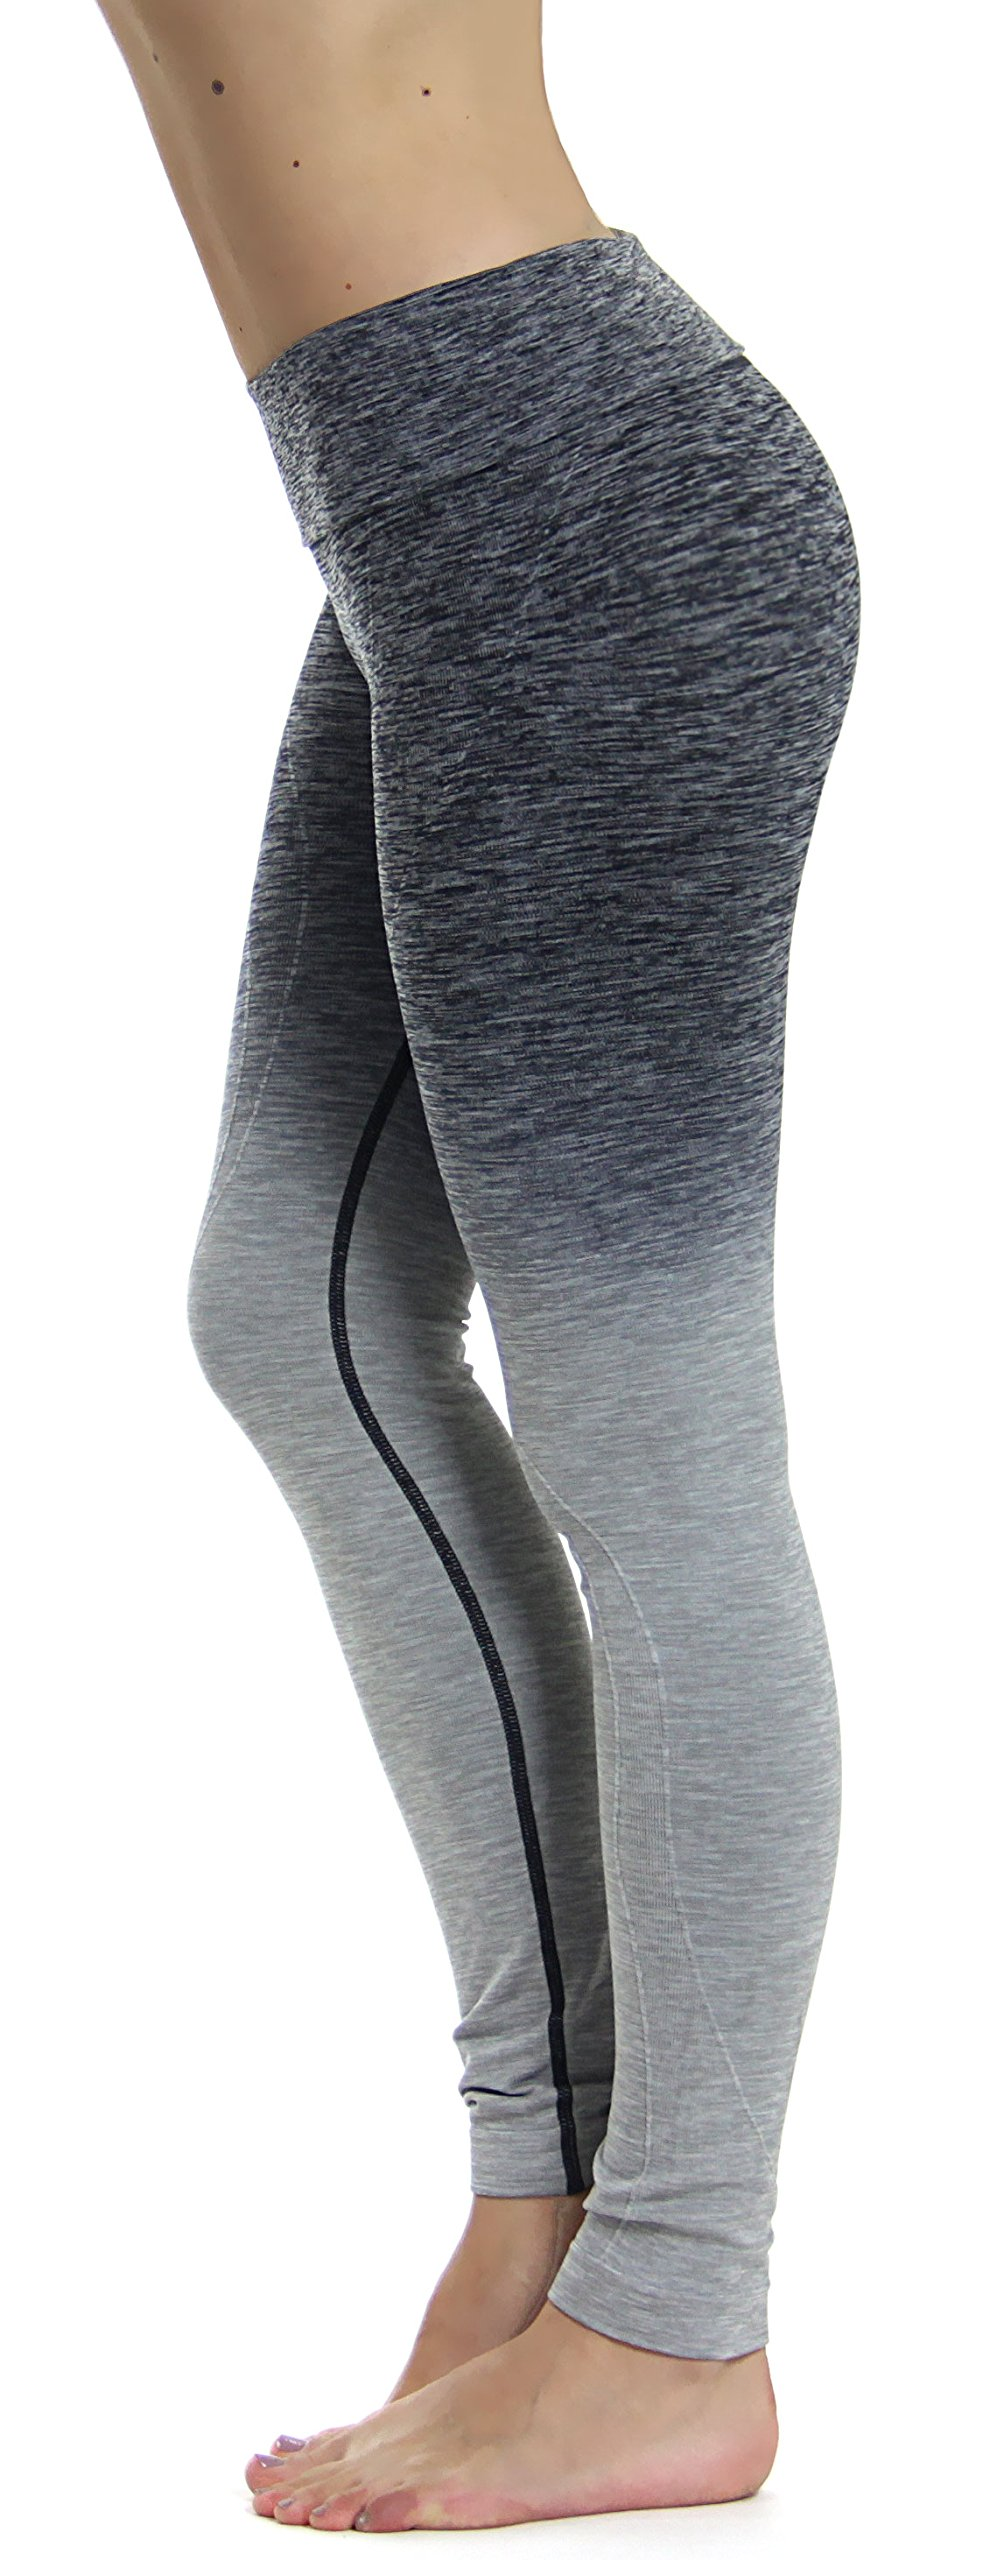 Prolific Health Fitness Power Flex Yoga Pants Leggings XS - XL (XXL (US Size 18-20), Ombre Gray Plus Size)